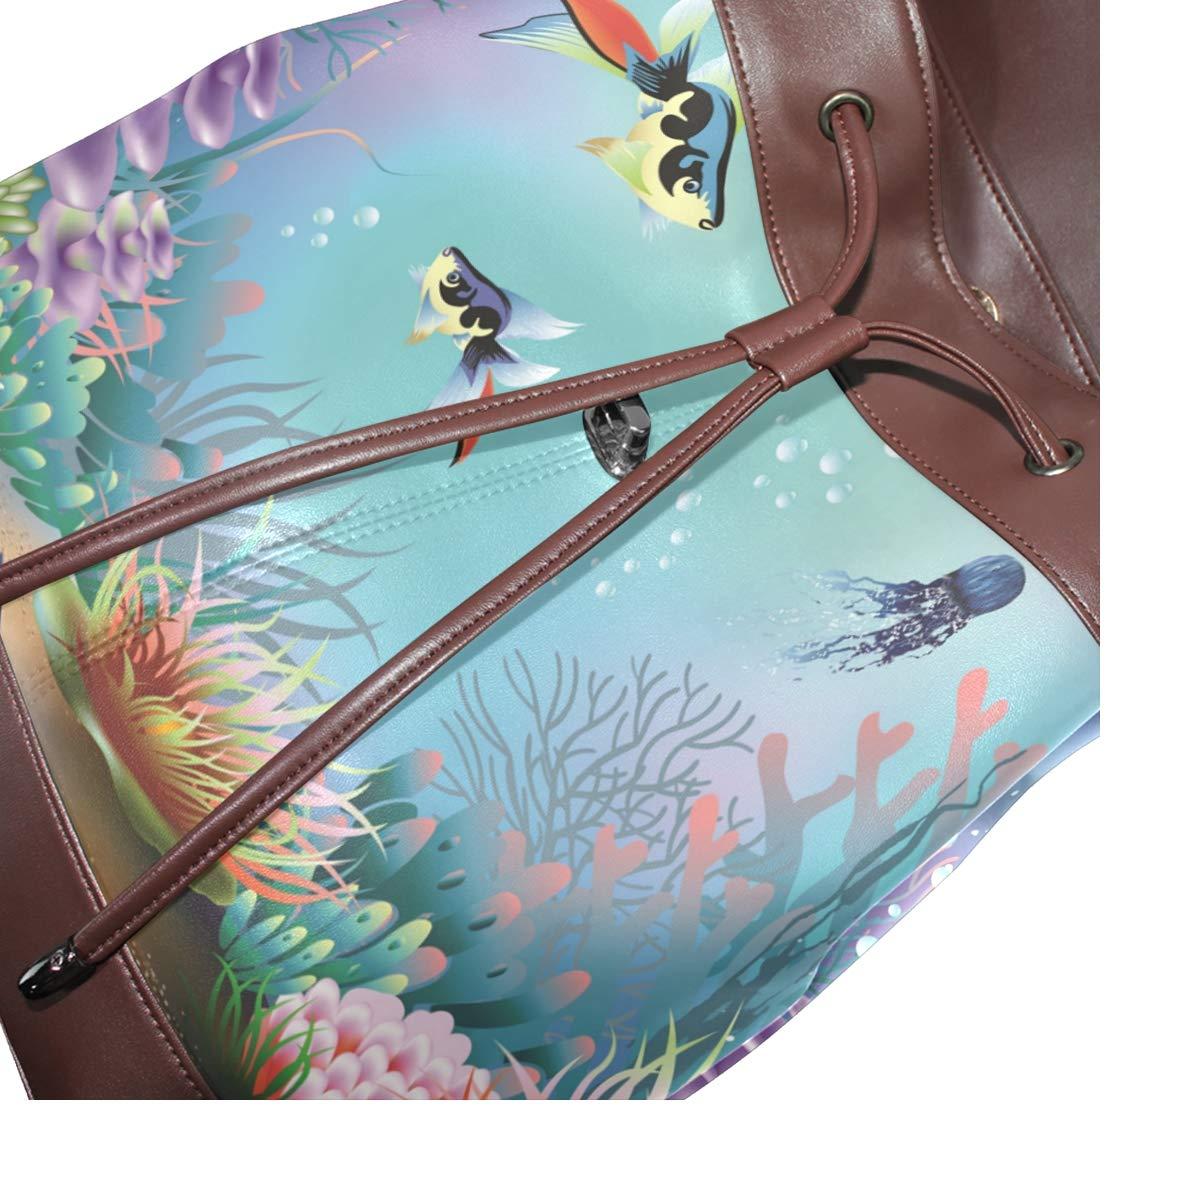 PU Leather Backpack Ornamental Fish drawstring for Travel Rucksack Daypack Casual Duffel Shoulder Bag